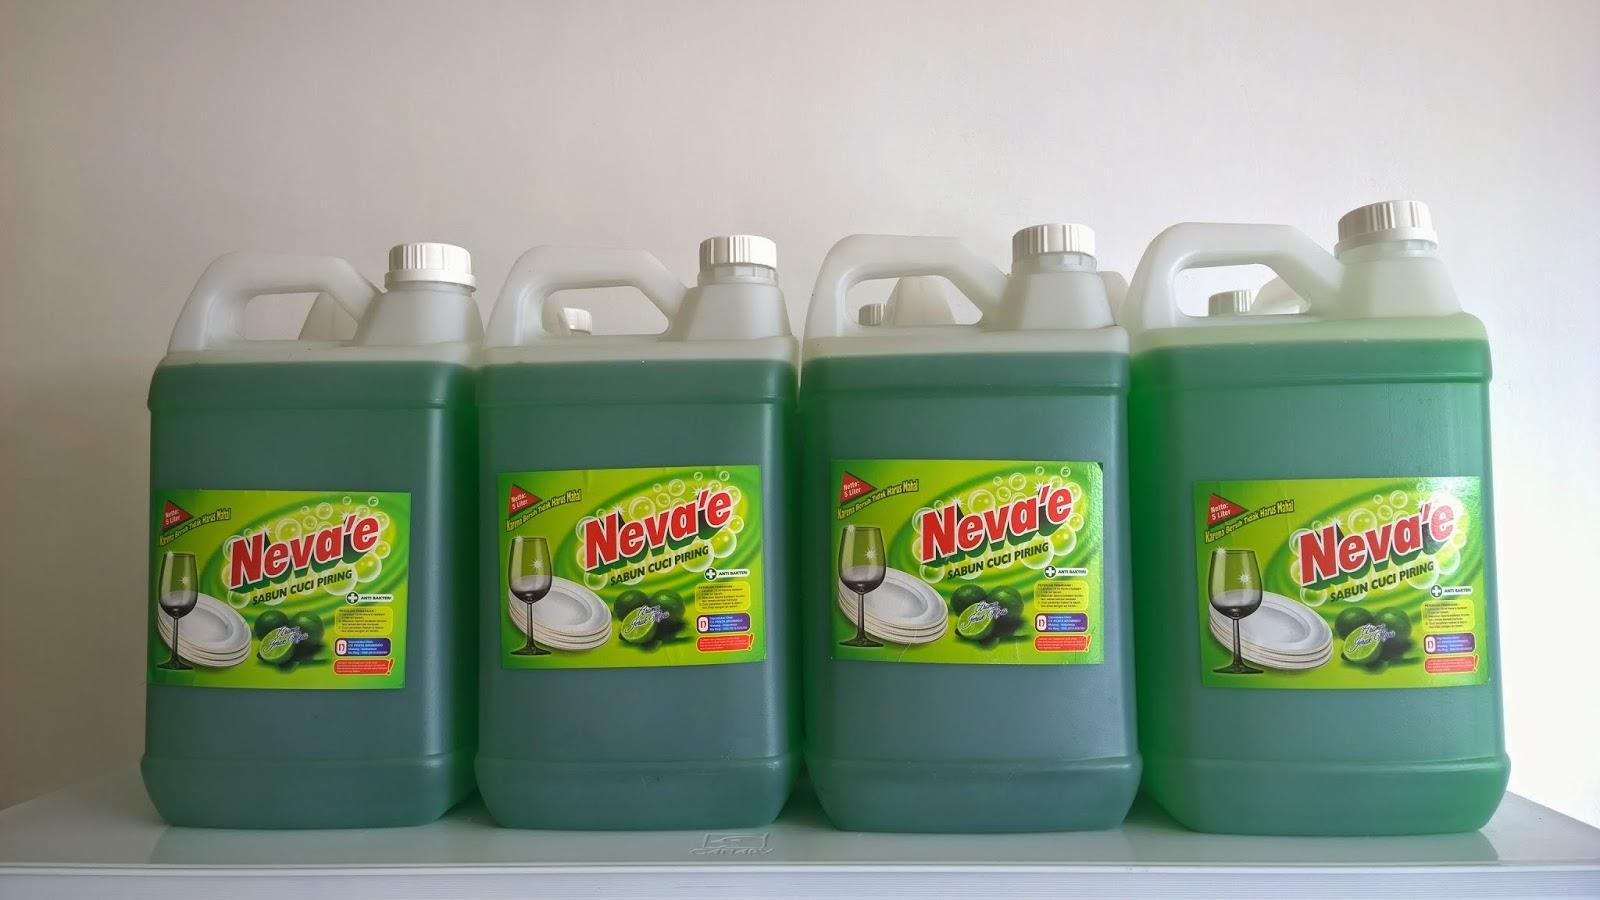 Distributor Supplier Bahan Pokok Sembako Pusat Penjualan Minyak Goreng Bimoli 1 Dus 2 Liter Ptsinar Mas